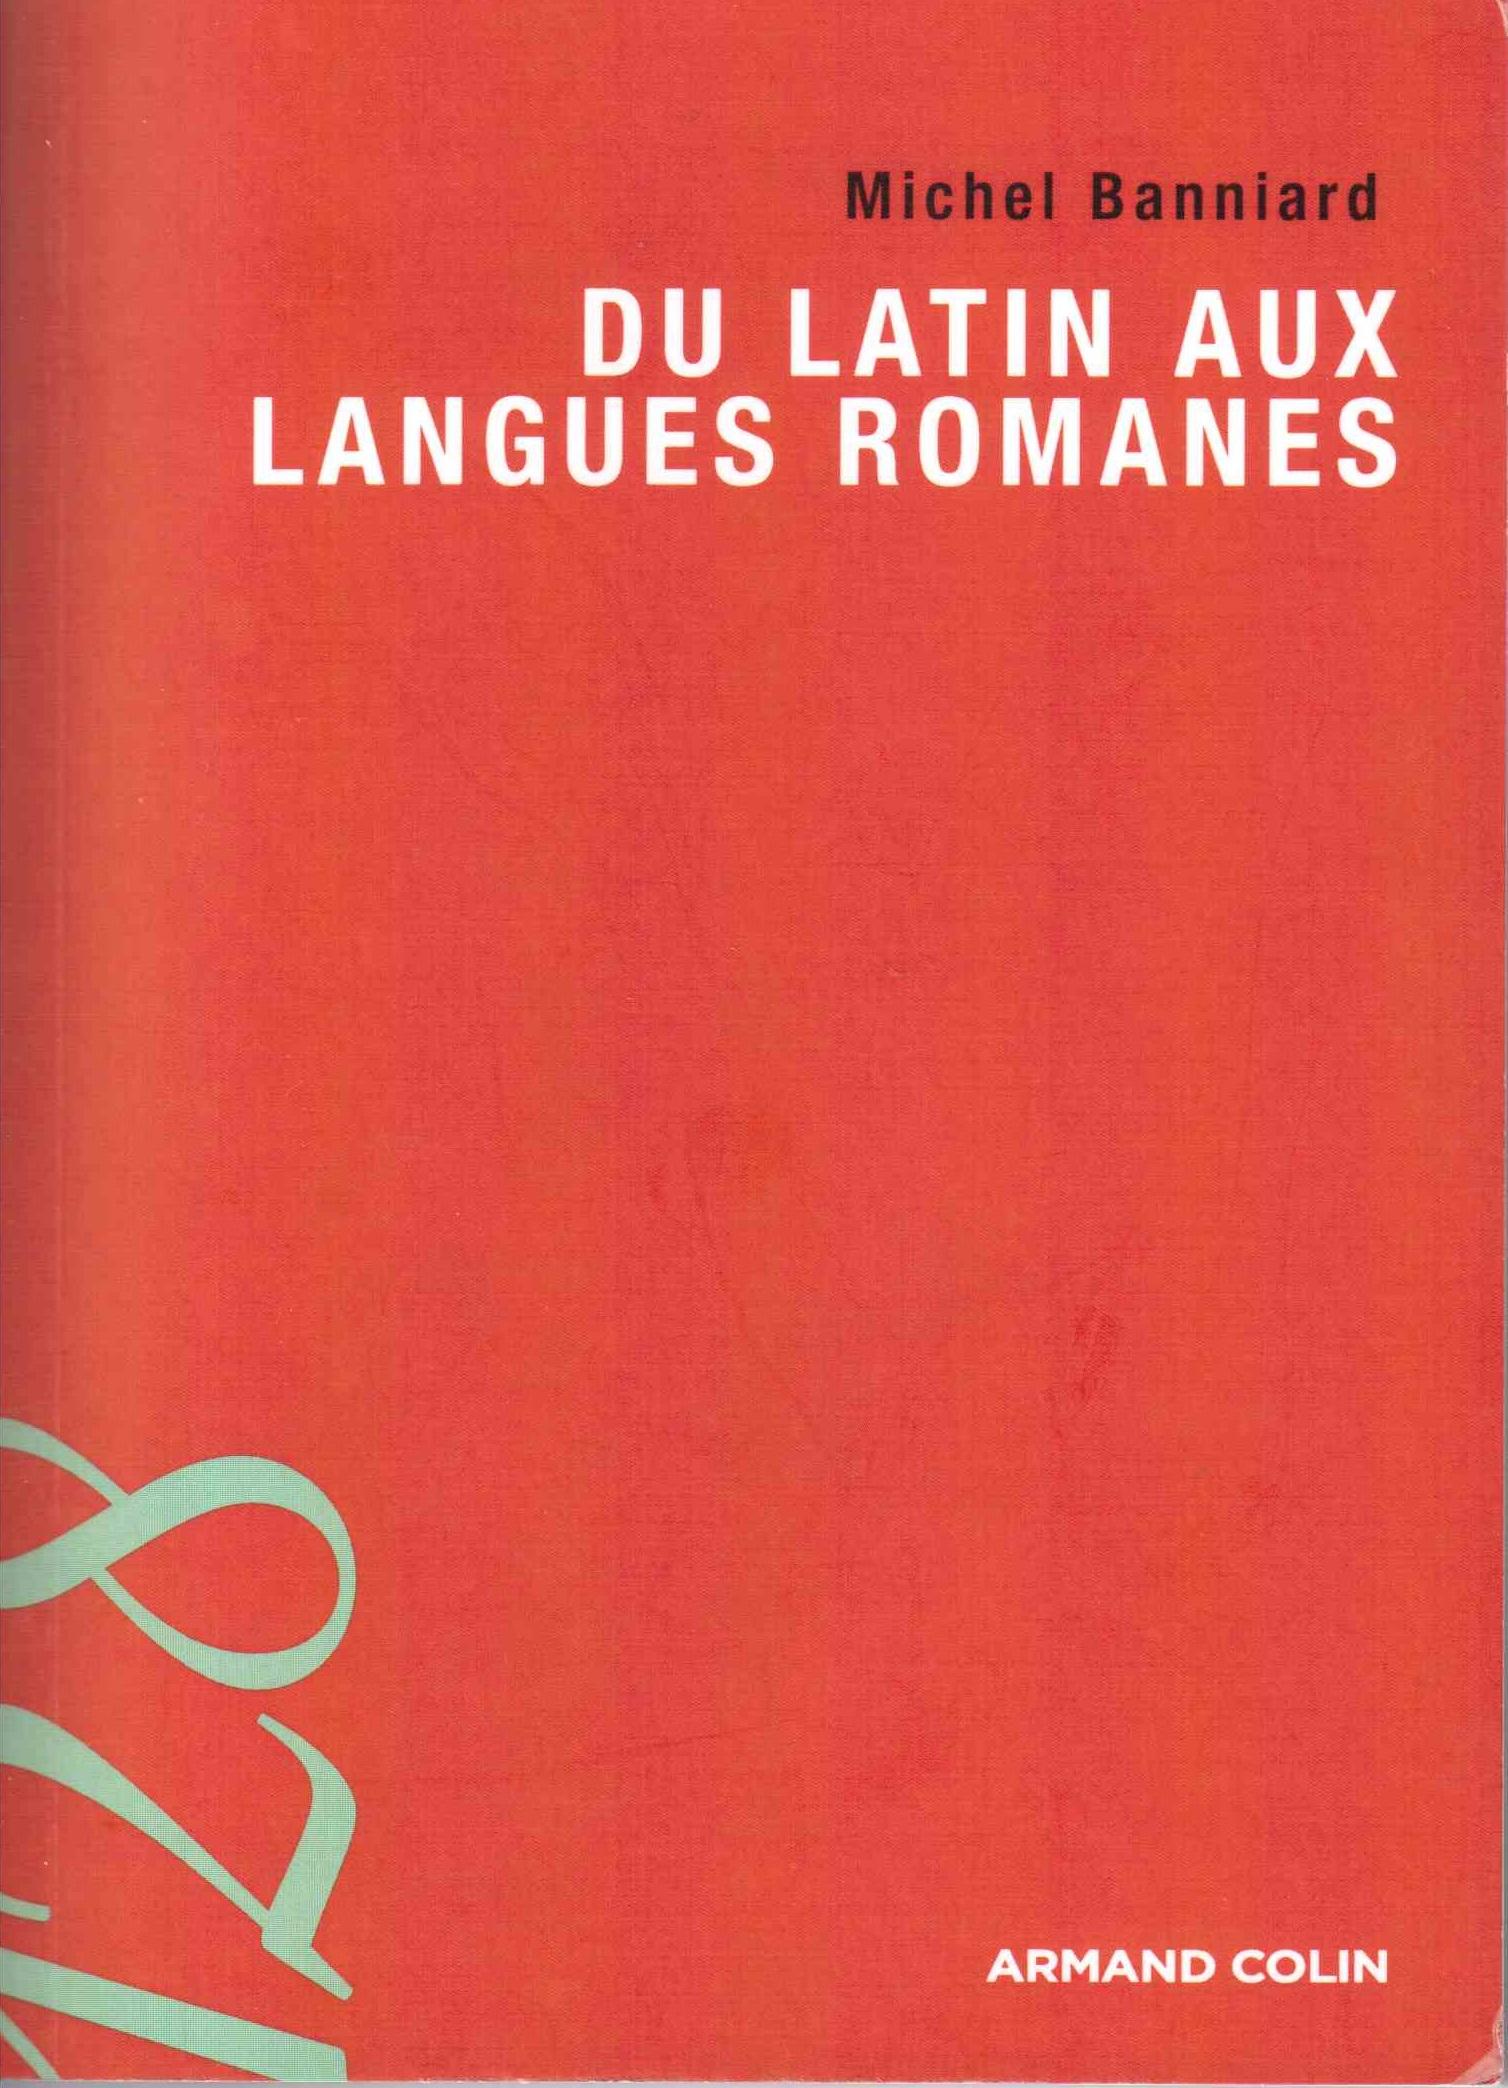 LatinLanguesRomanes